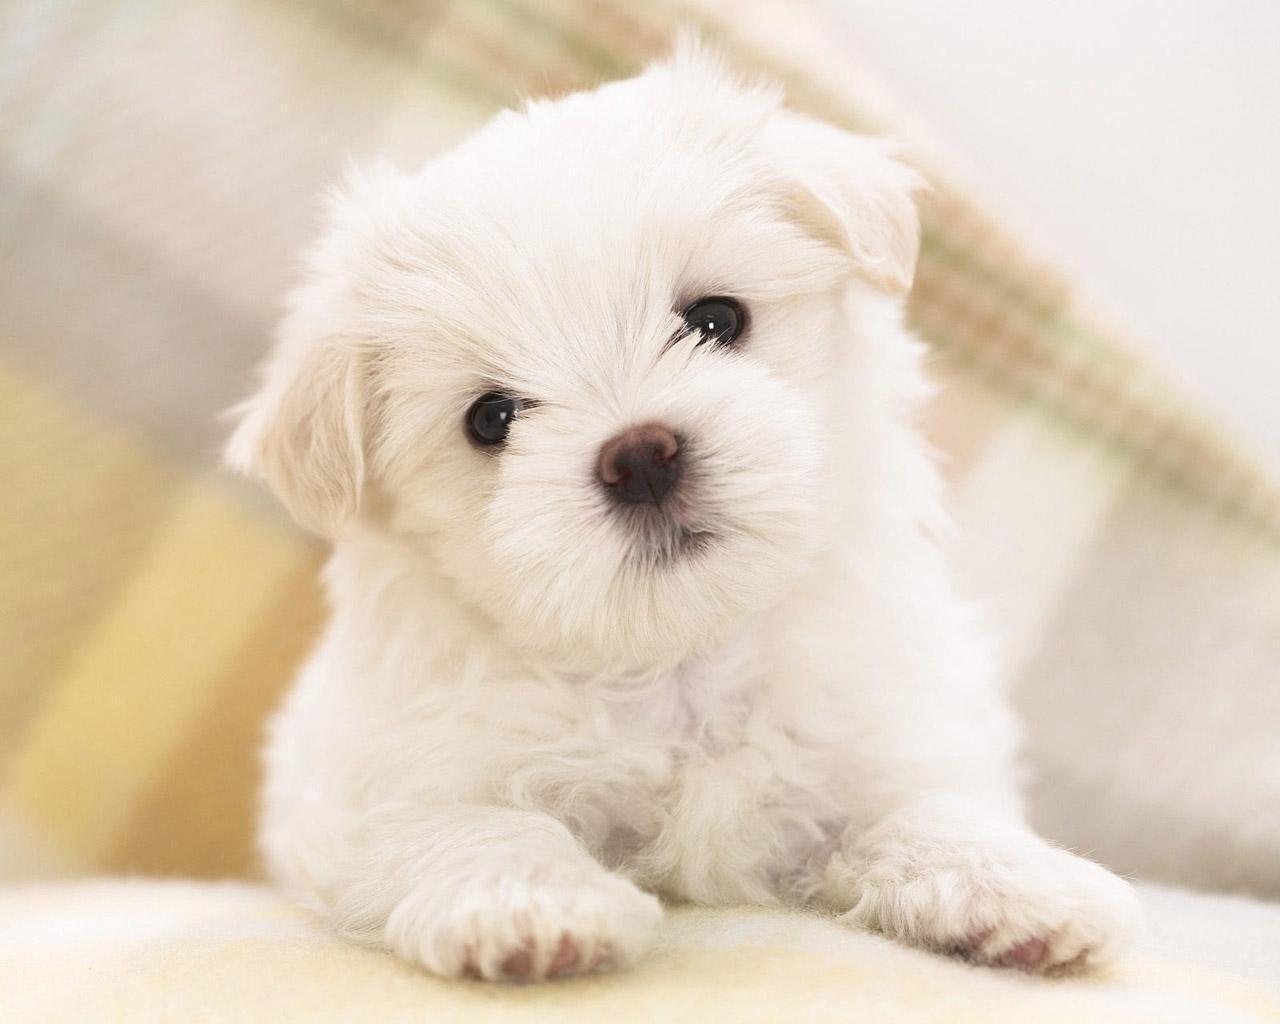 Cute-Wallpaper-teddybear64-20682571-1280-1024